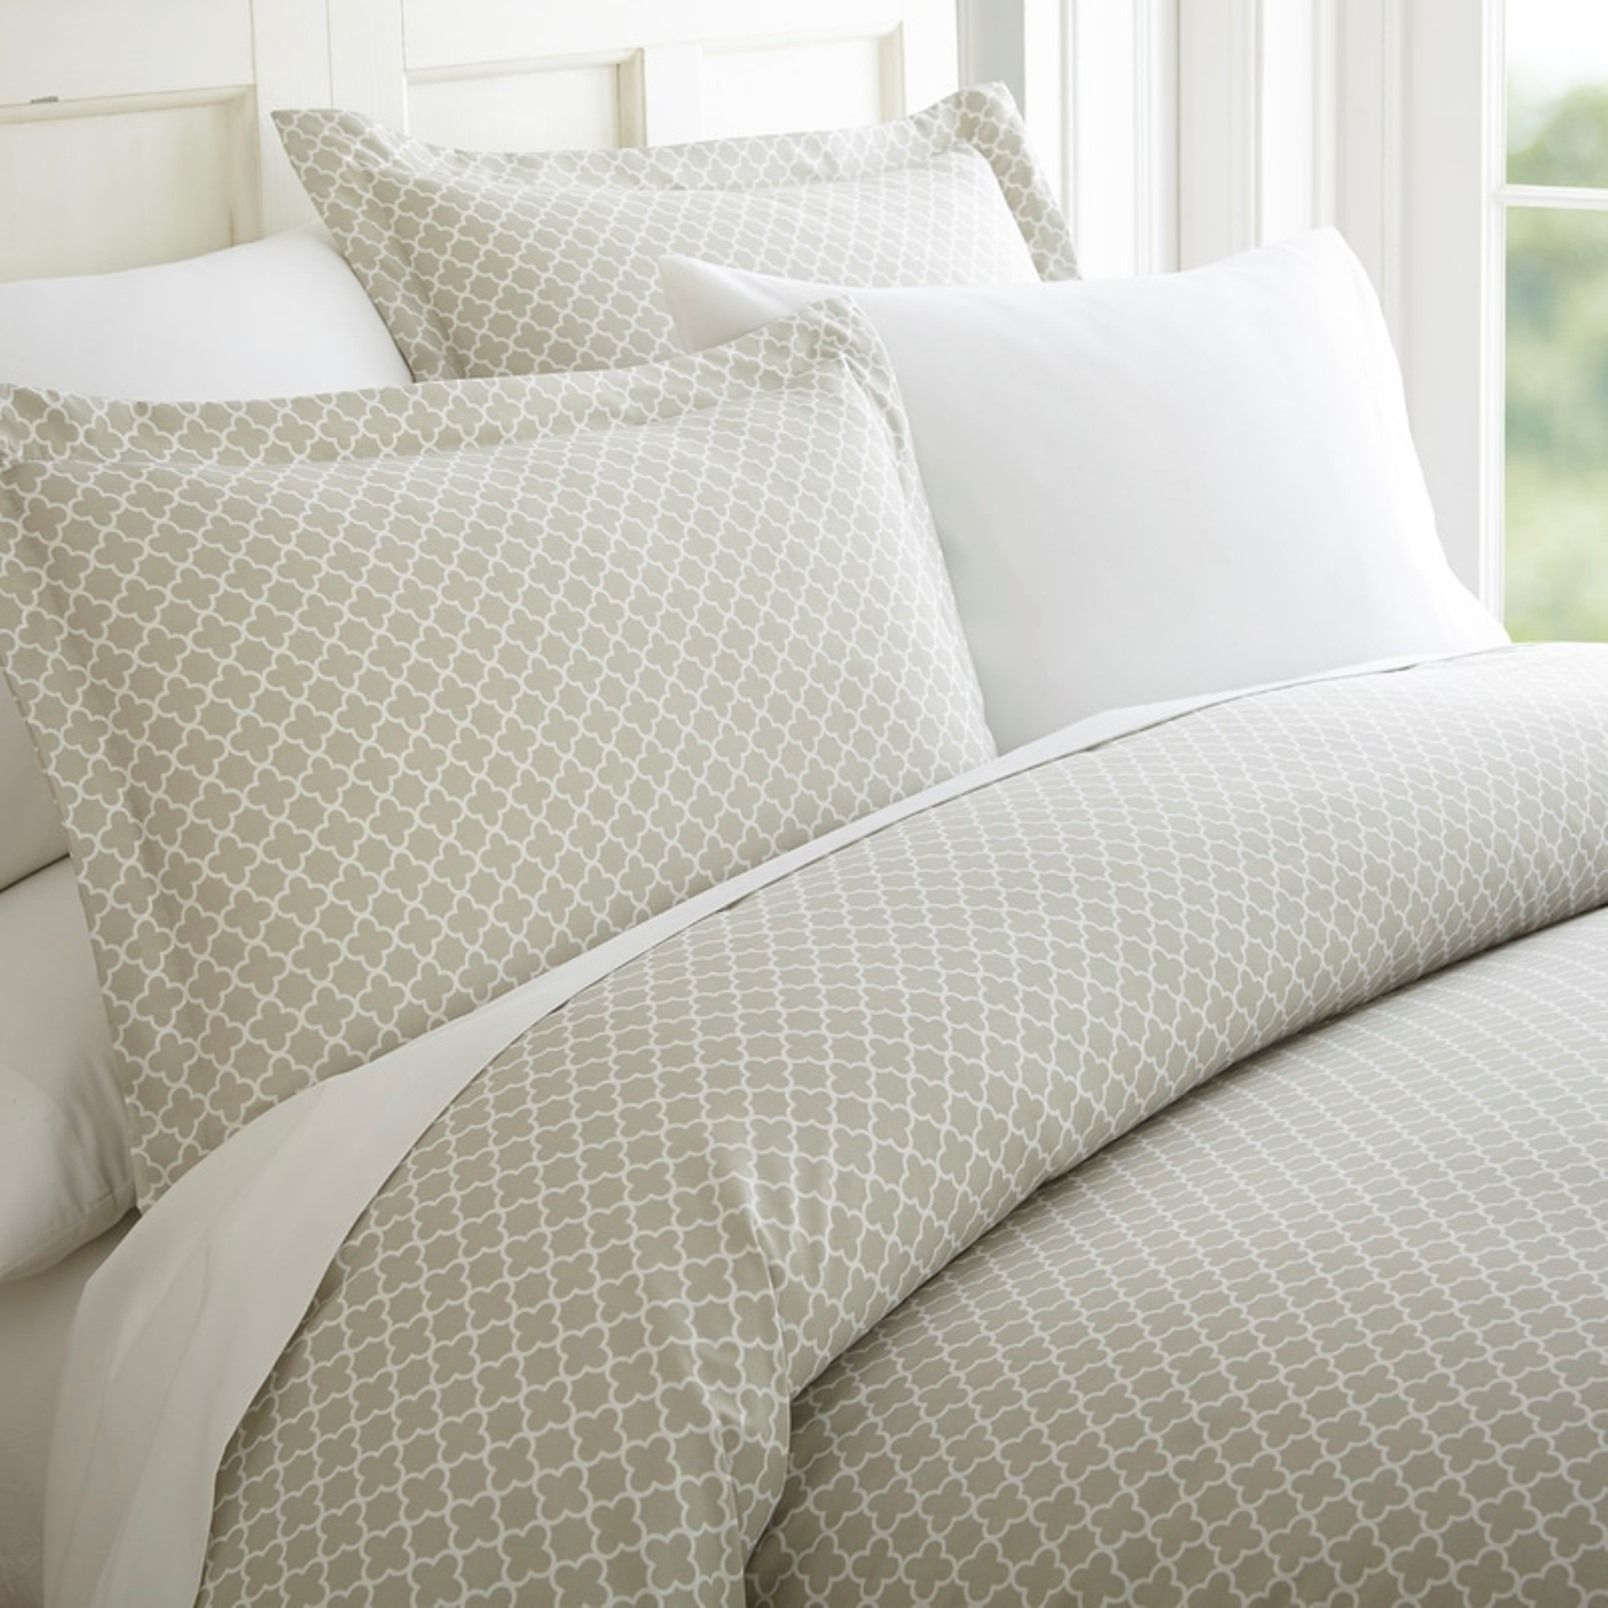 Ienjoy Home Premium Ultra Soft Quatrefoil Pattern 3 Piece